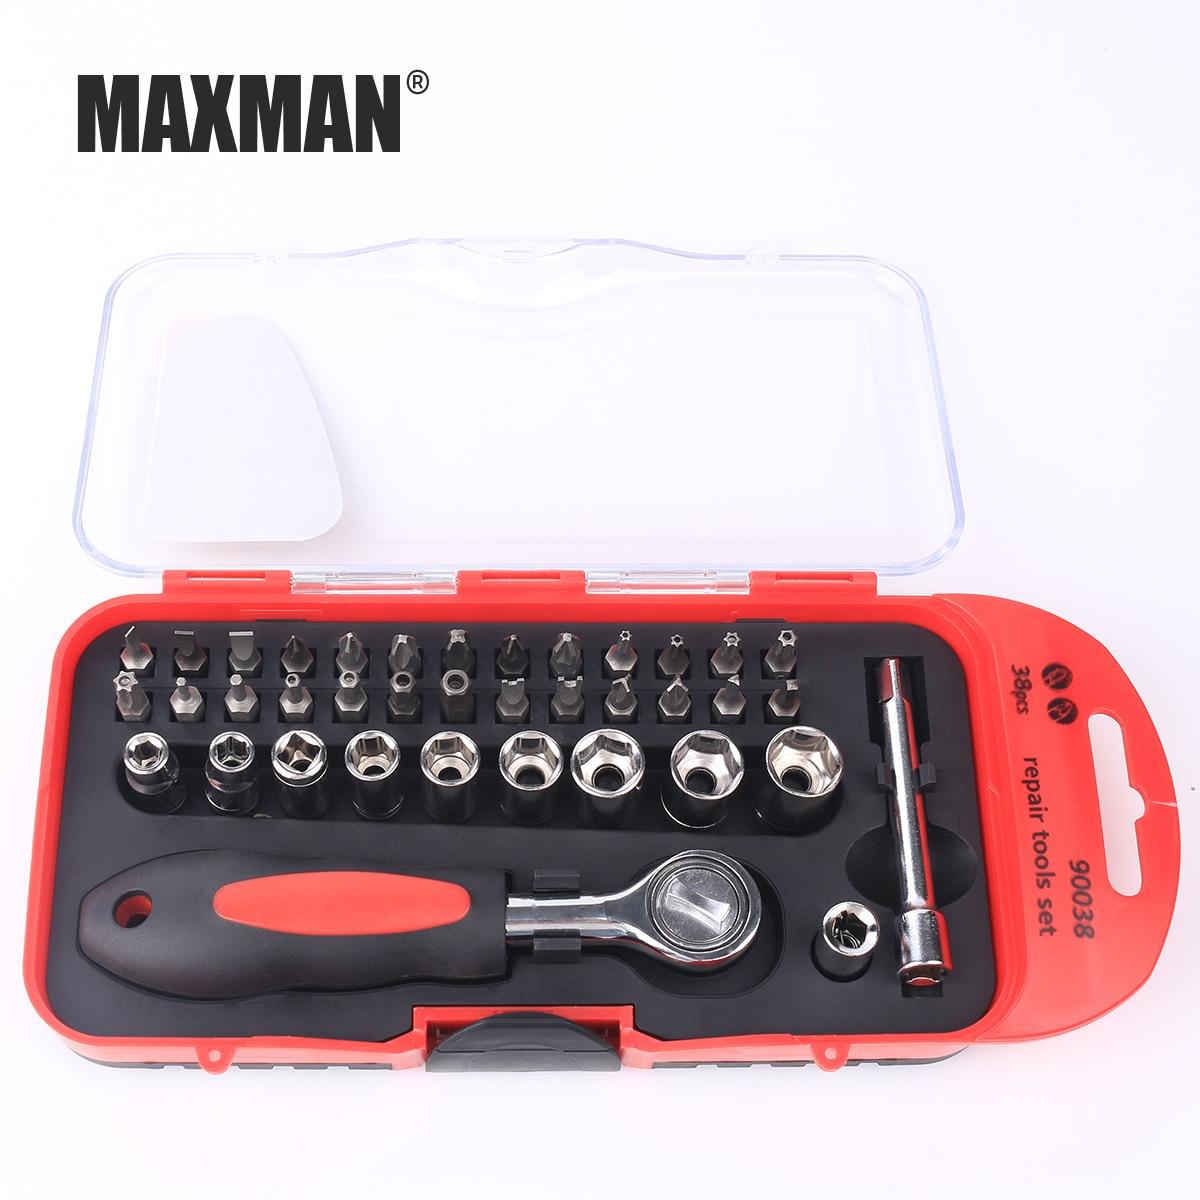 Купить с кэшбэком MAXMAN HAND TOOLS Socket Ratchet Torque Wrench Extension Bar Drill Bits Automobiles Repair Tools Kit Multifunction Hand Tool Kit